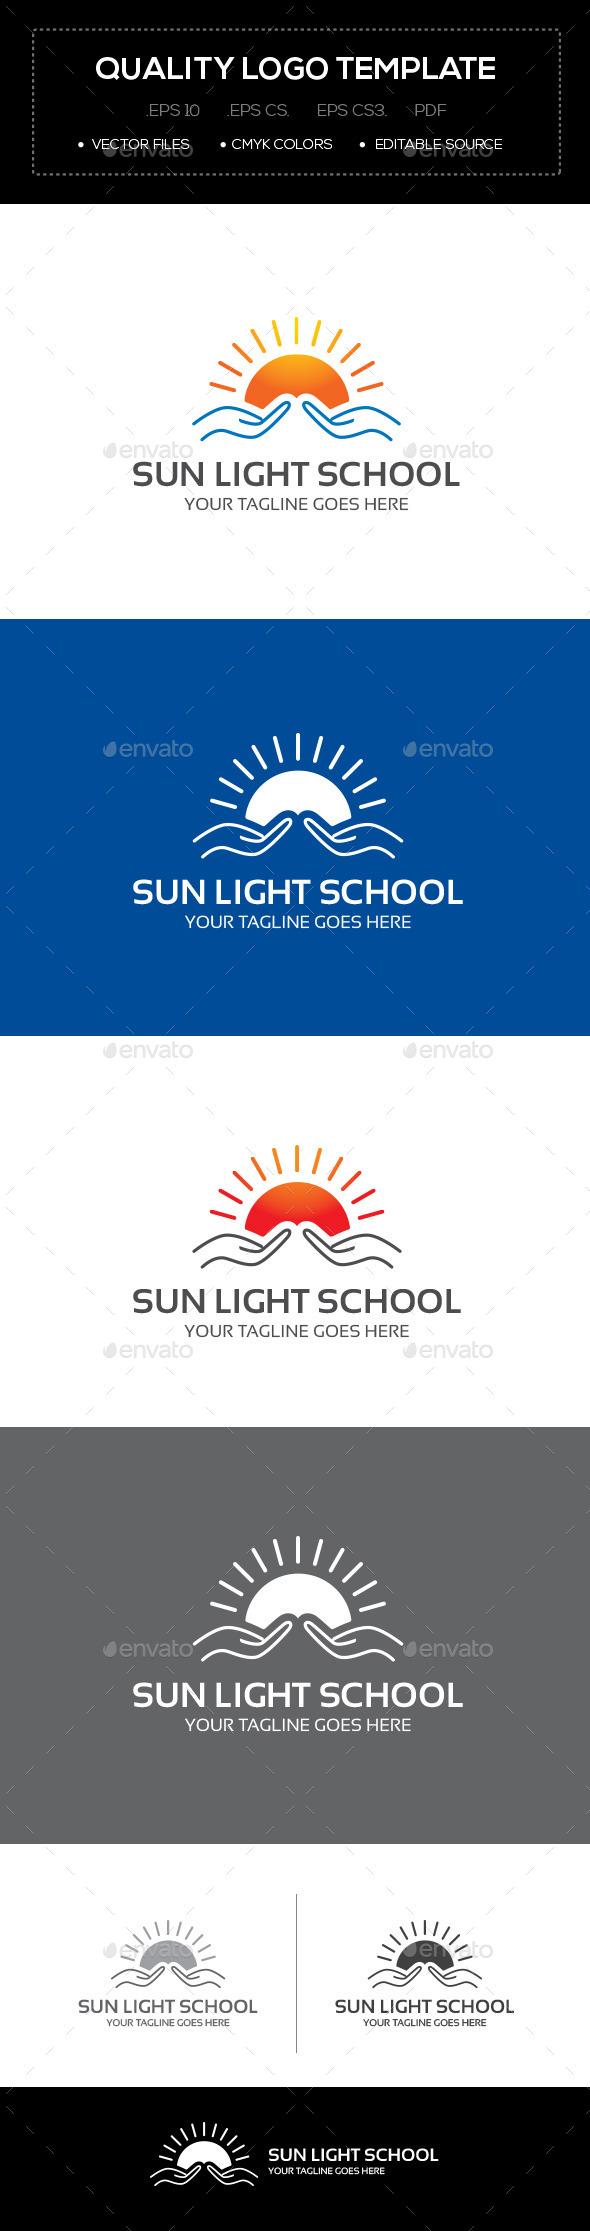 Sun Light School Logo Template - Logo Templates